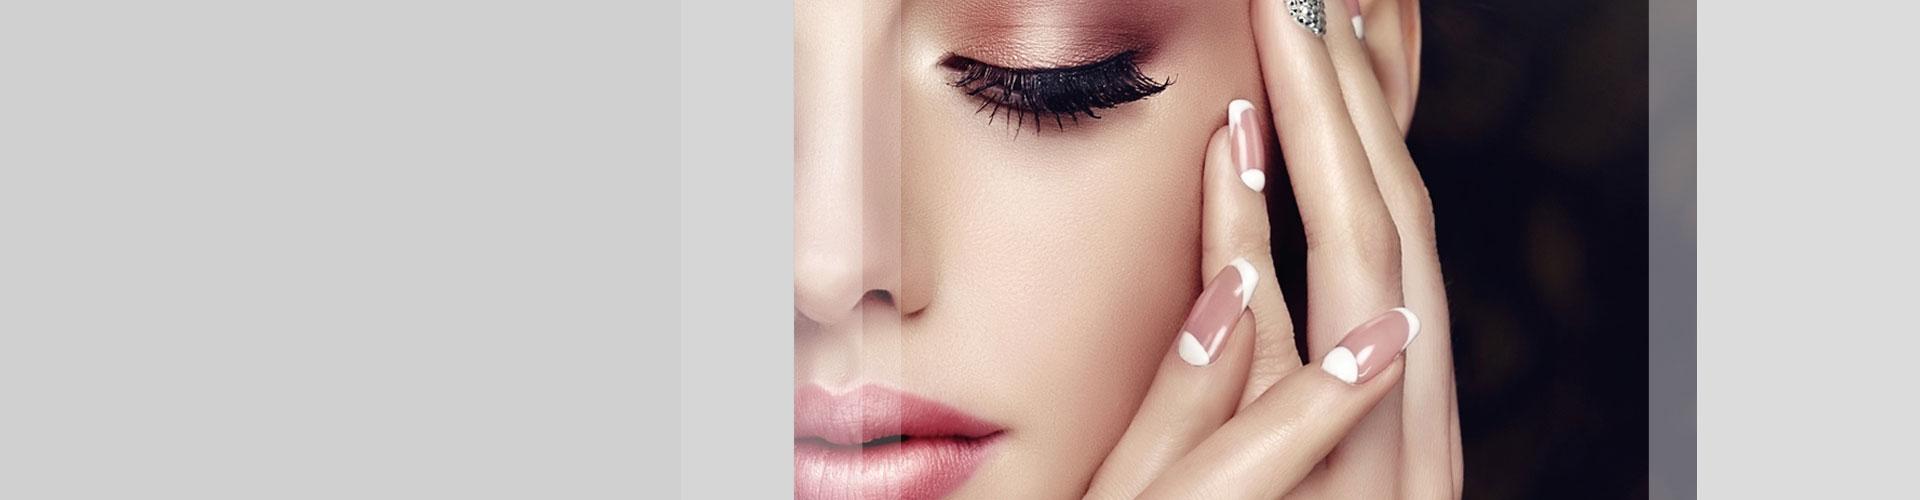 schoen-sinn-sabine-heinrich-make-up